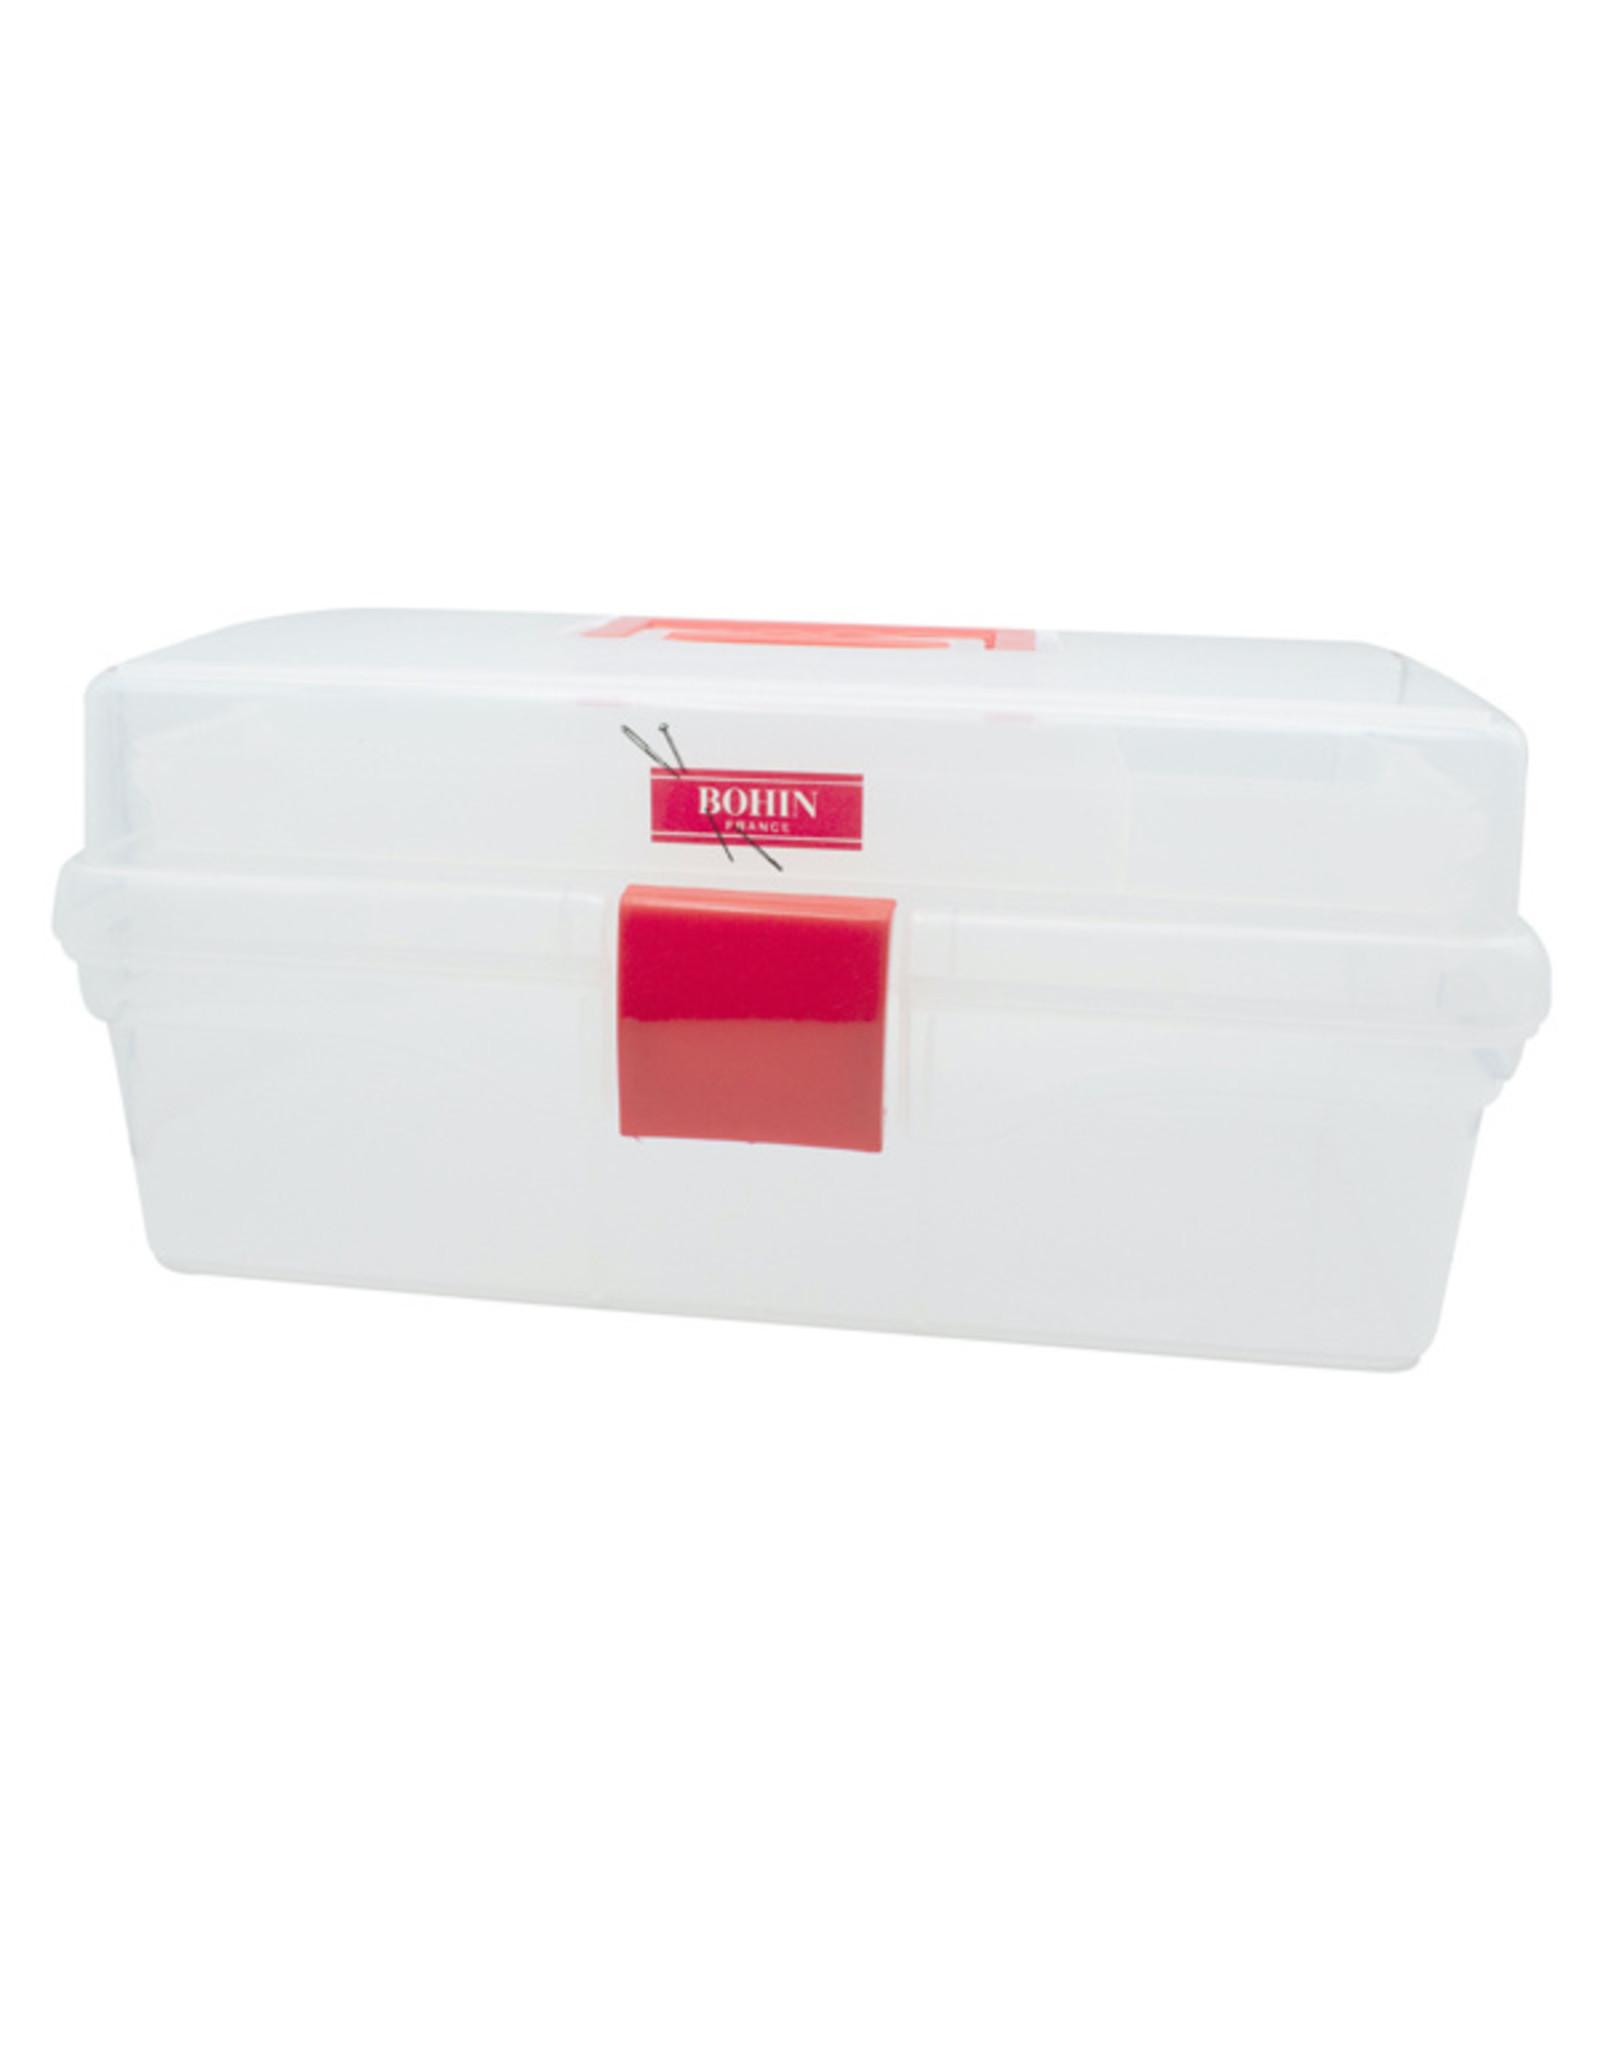 Bohin Naaibox - Large